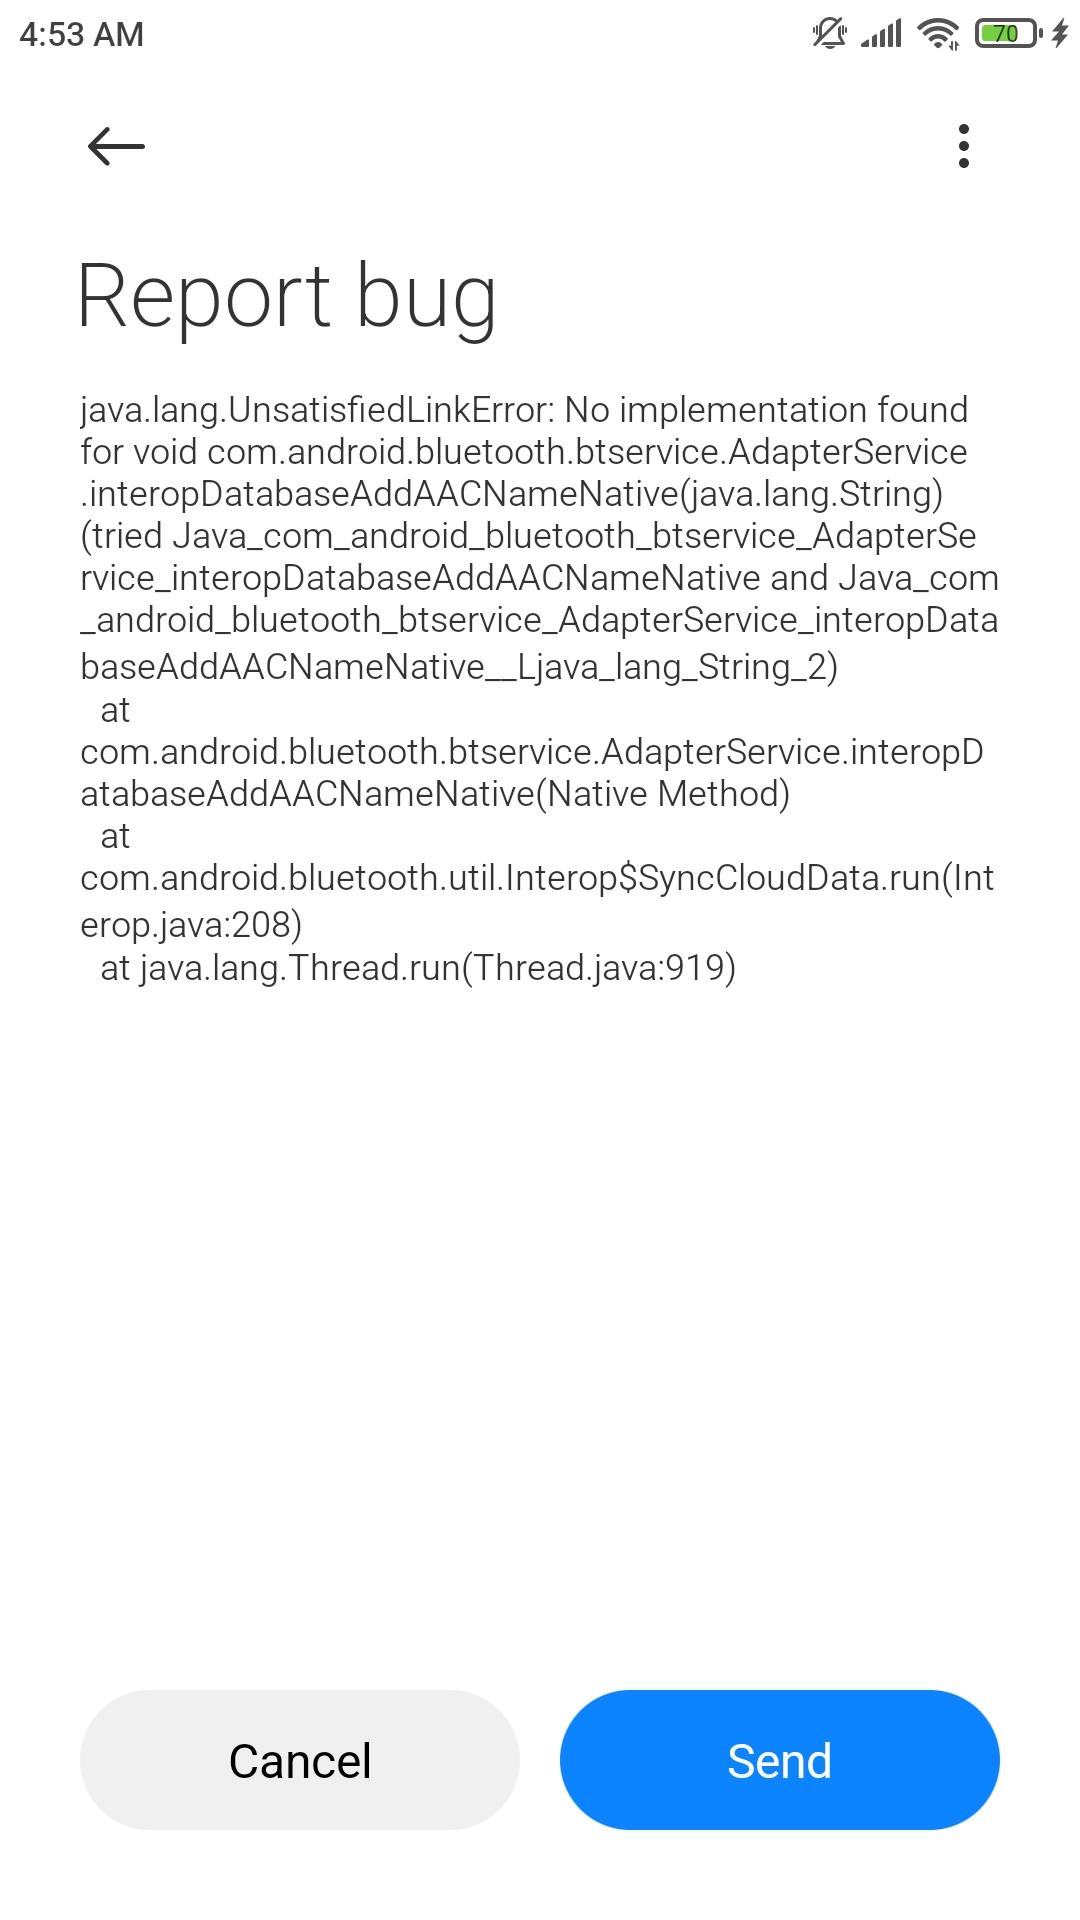 Screenshot_2021-02-03-04-53-40-364_com.miui.bugreport.jpg